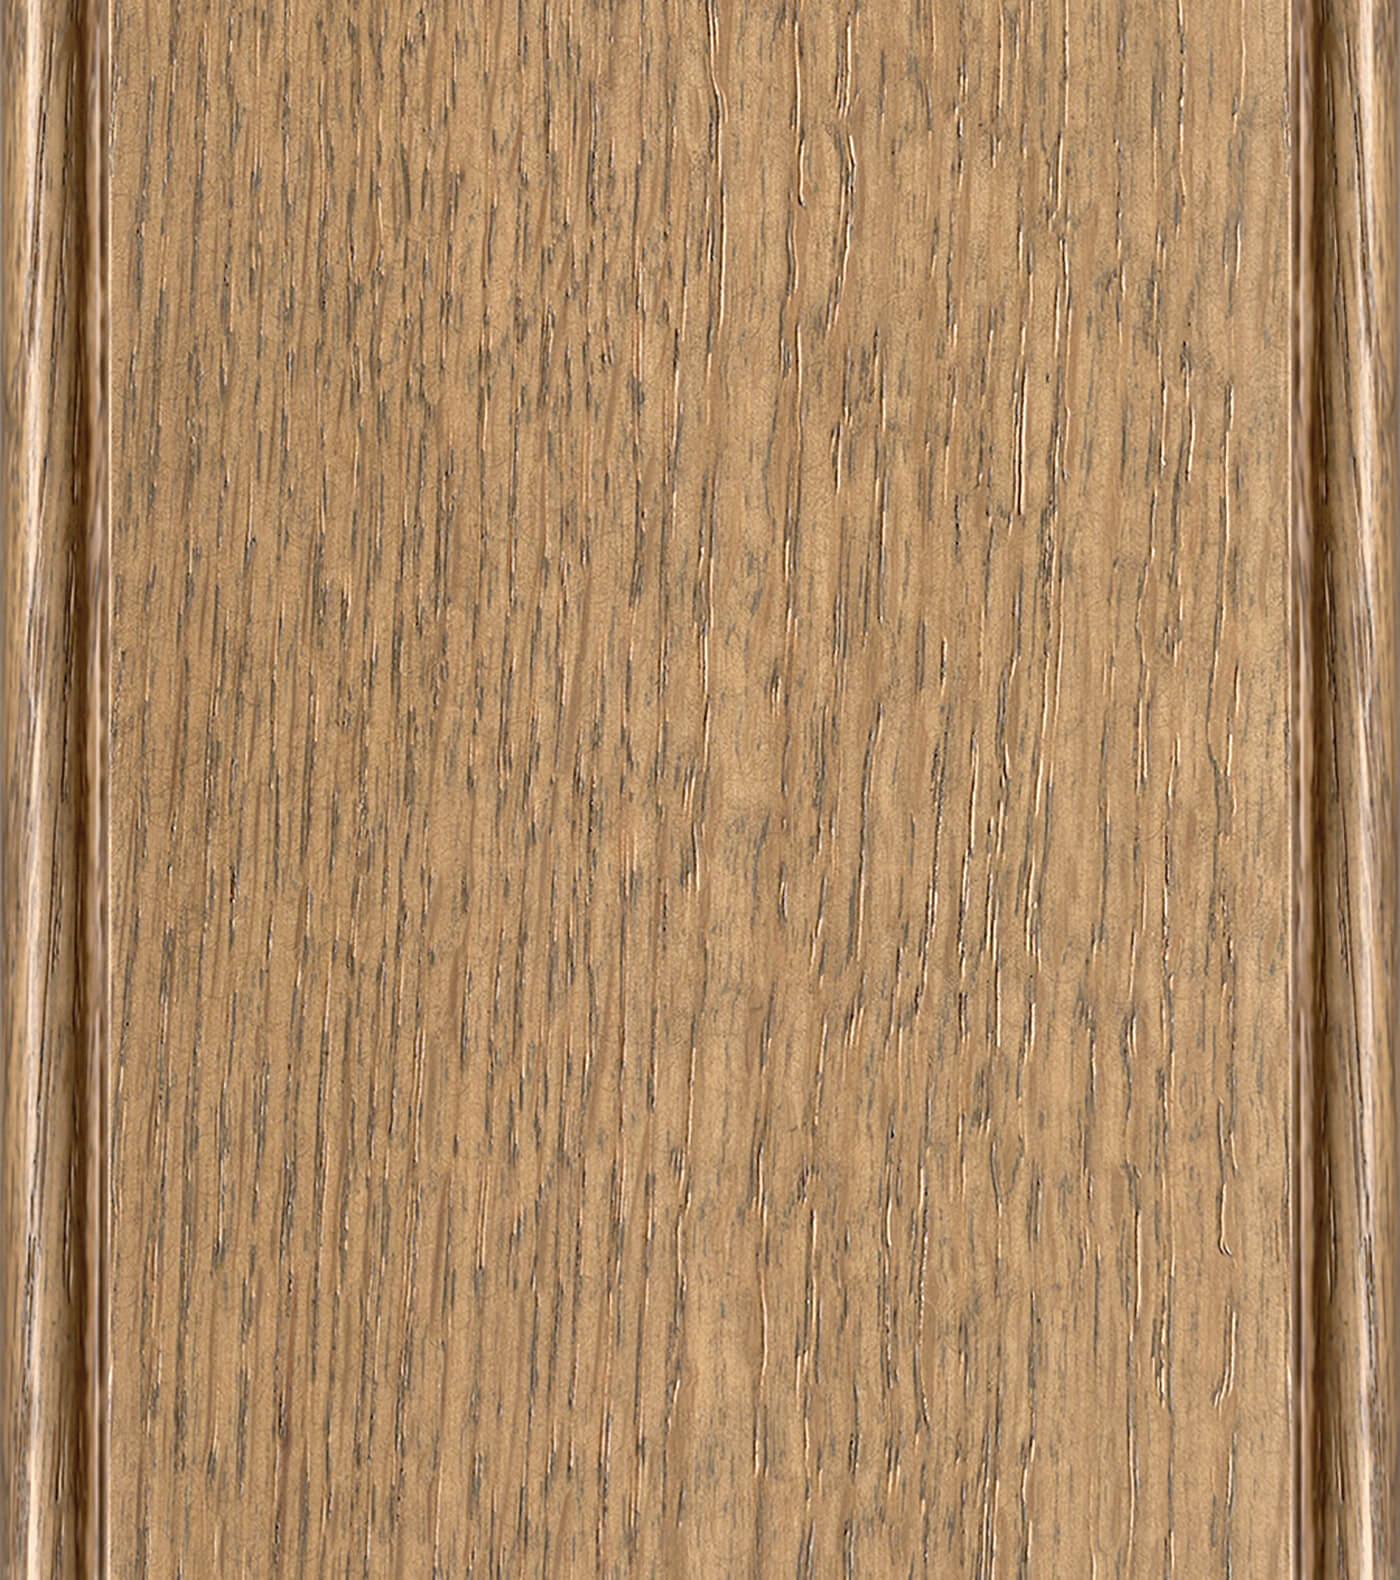 Sesame Stain on Red Oak or Quarter-Sawn Red Oak